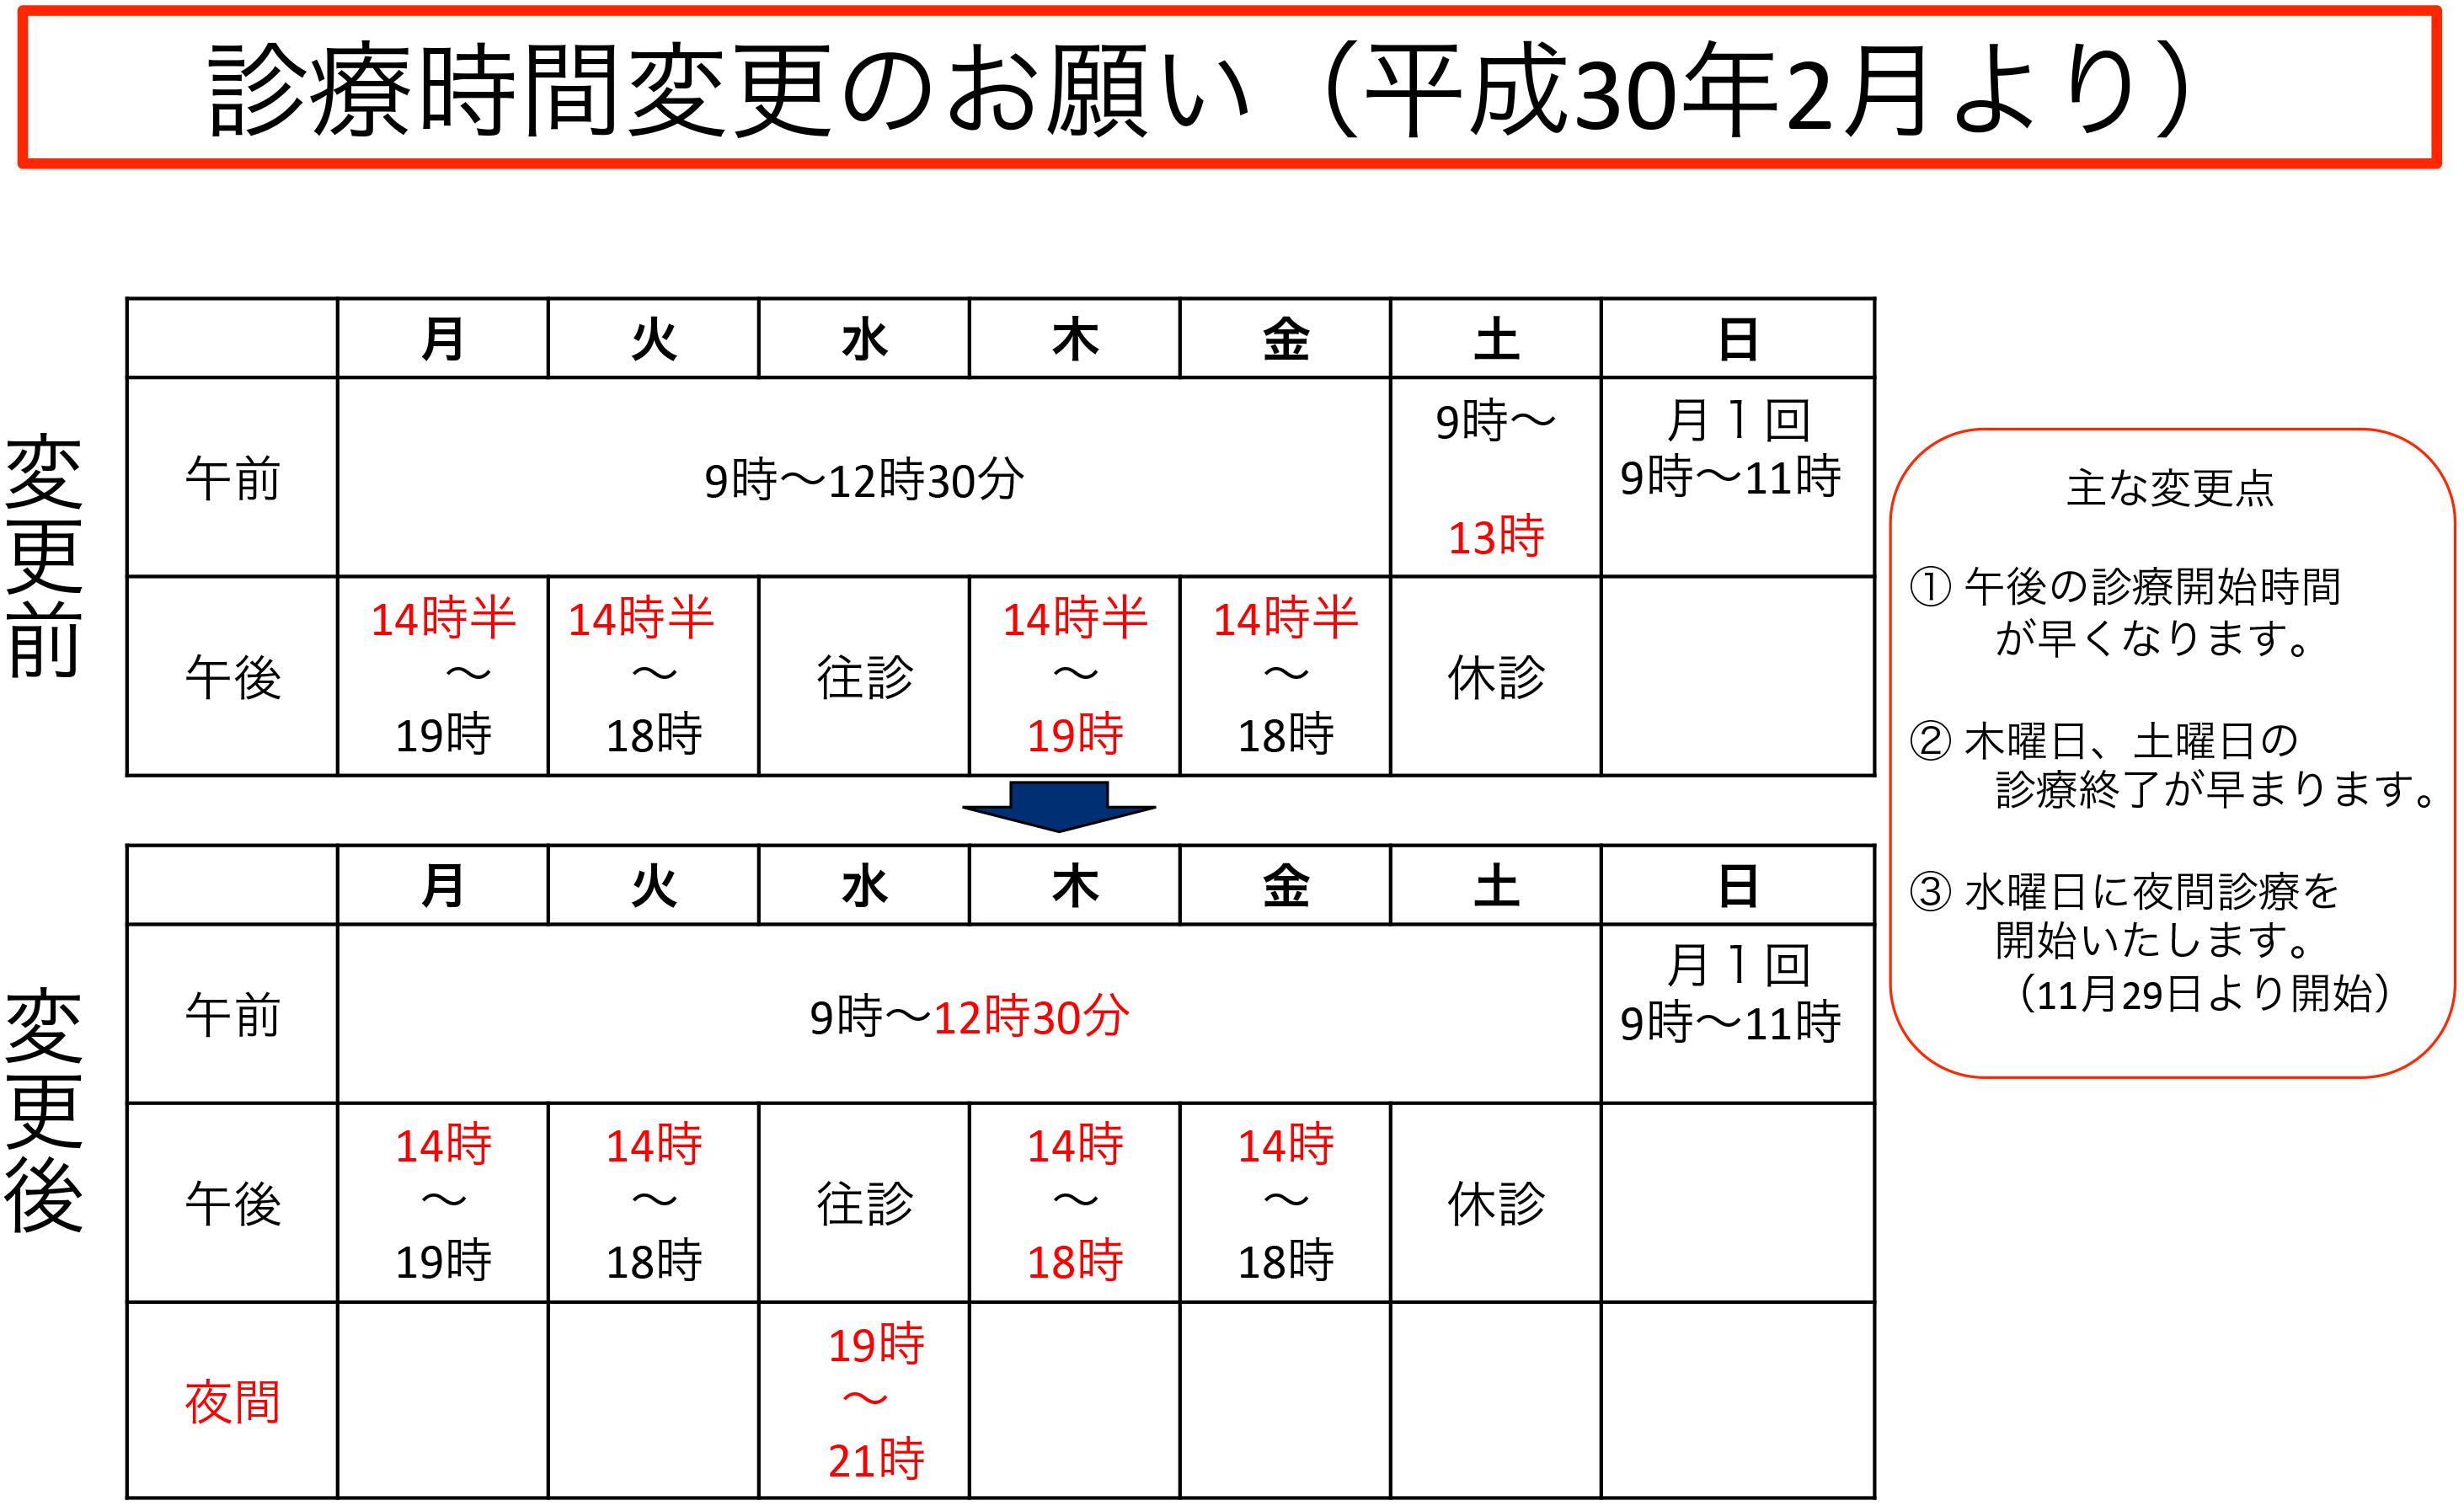 <p>平成30年2月から診療時間の変更について</p>